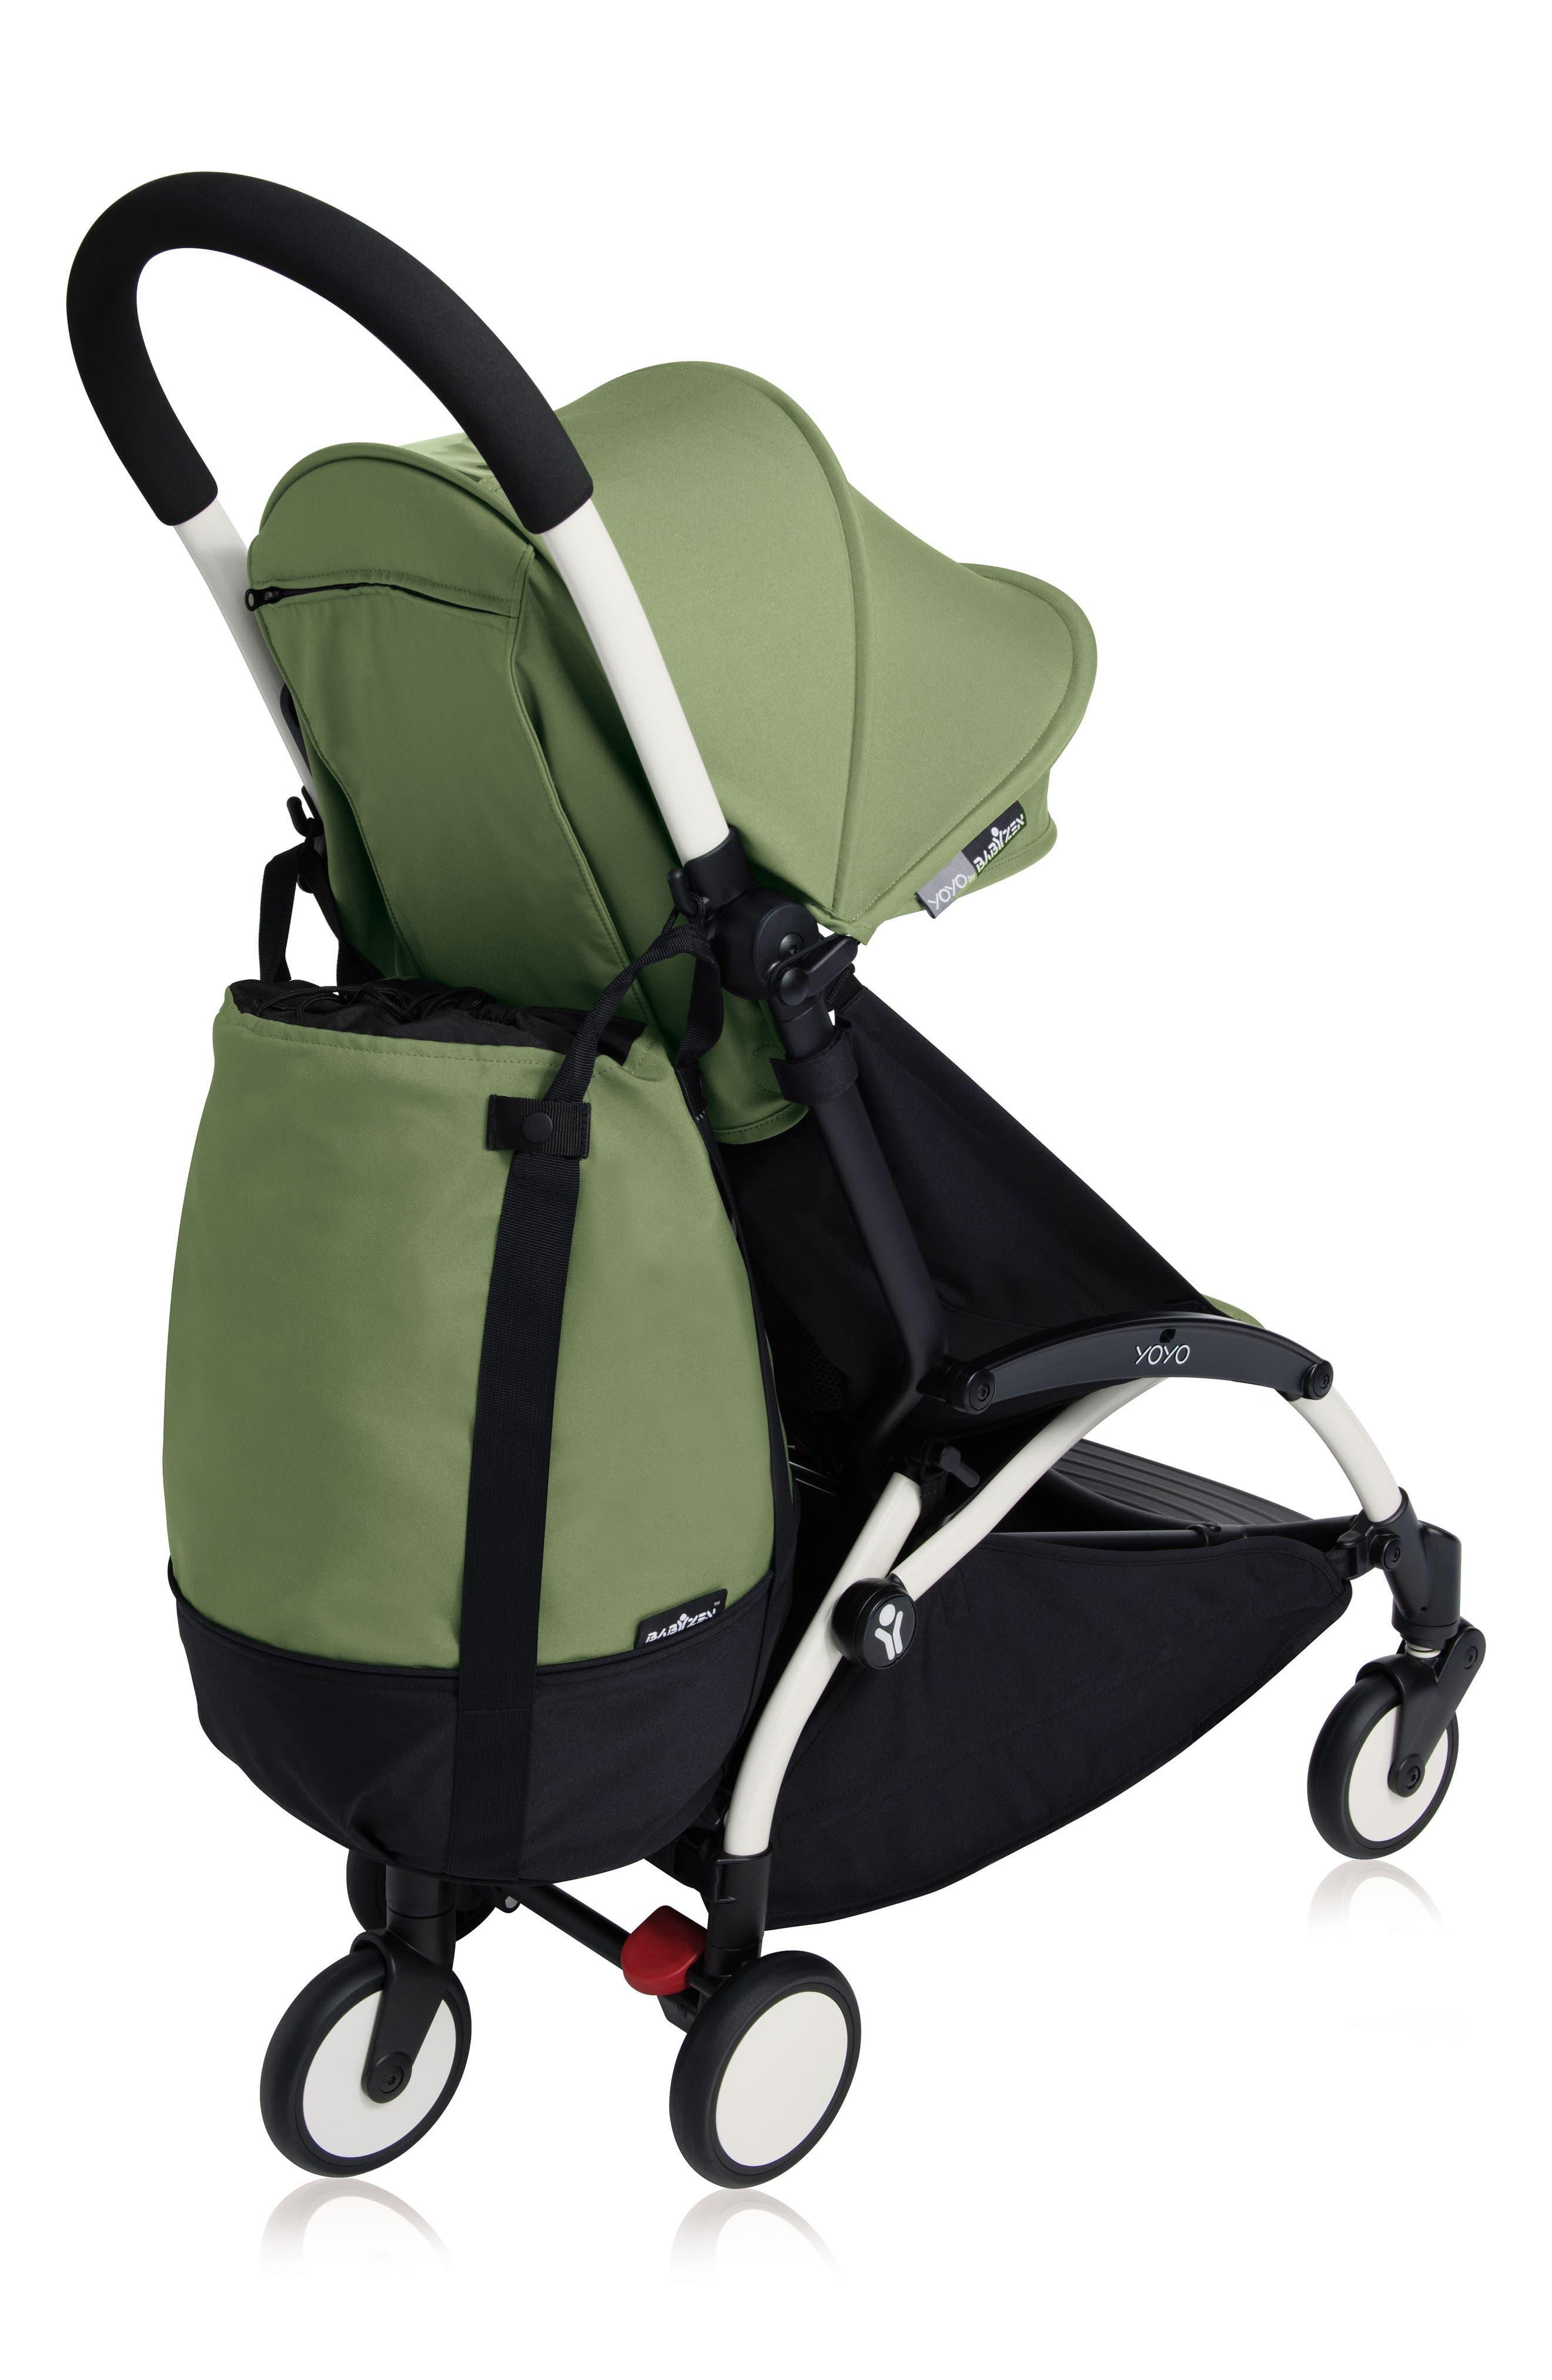 Infant Babyzen(TM) Yoyo Rolling Stroller Bag Size One Size  Green